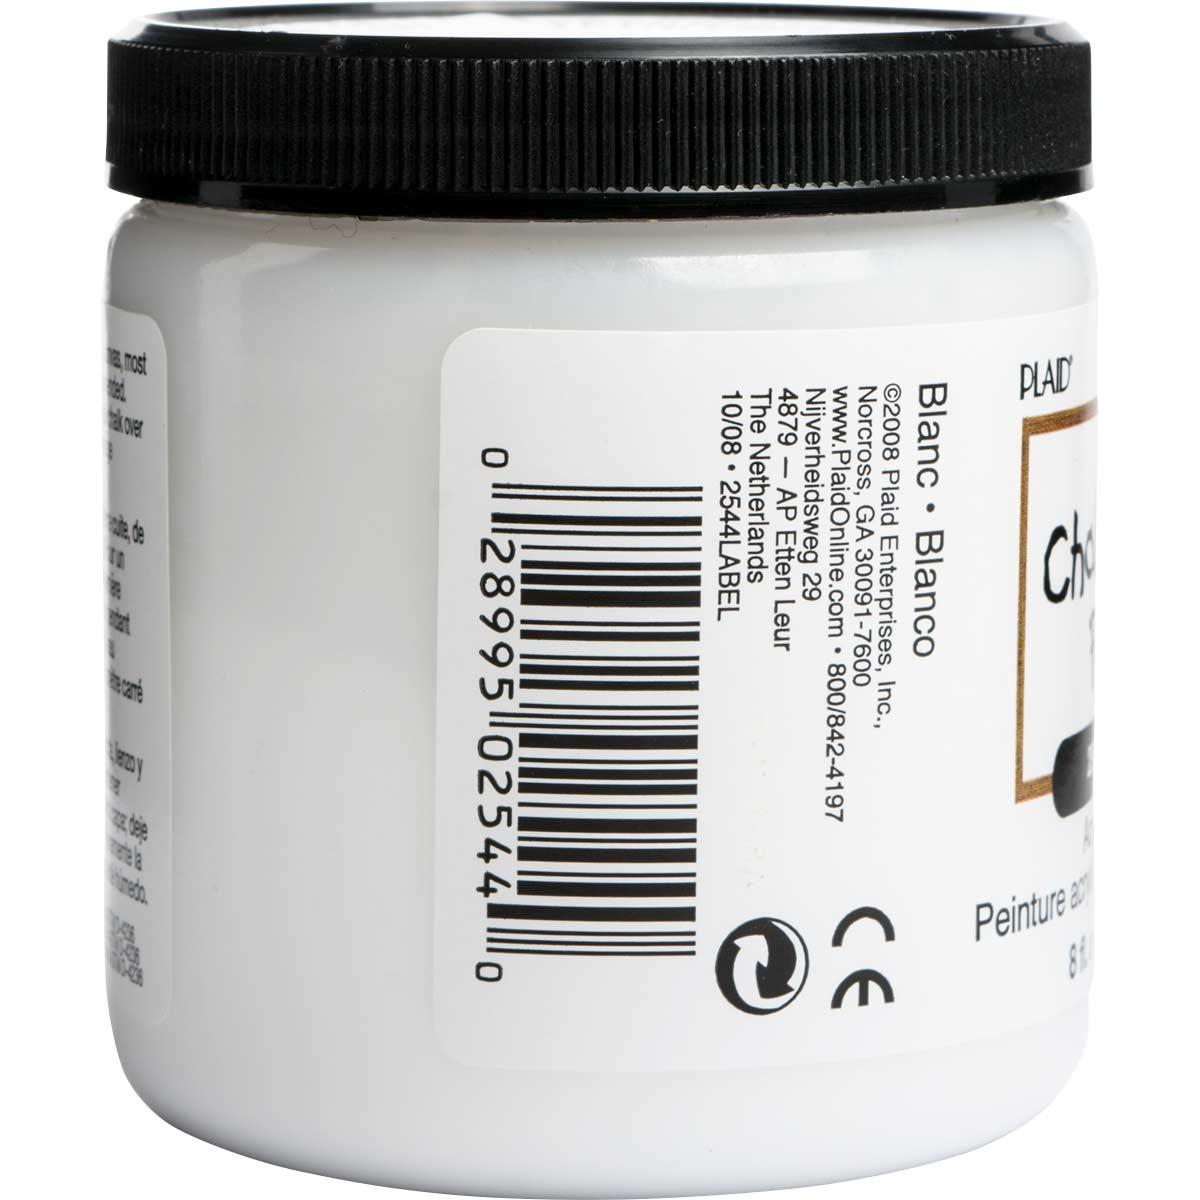 FolkArt ® Chalkboard Paint - White, 8 oz.